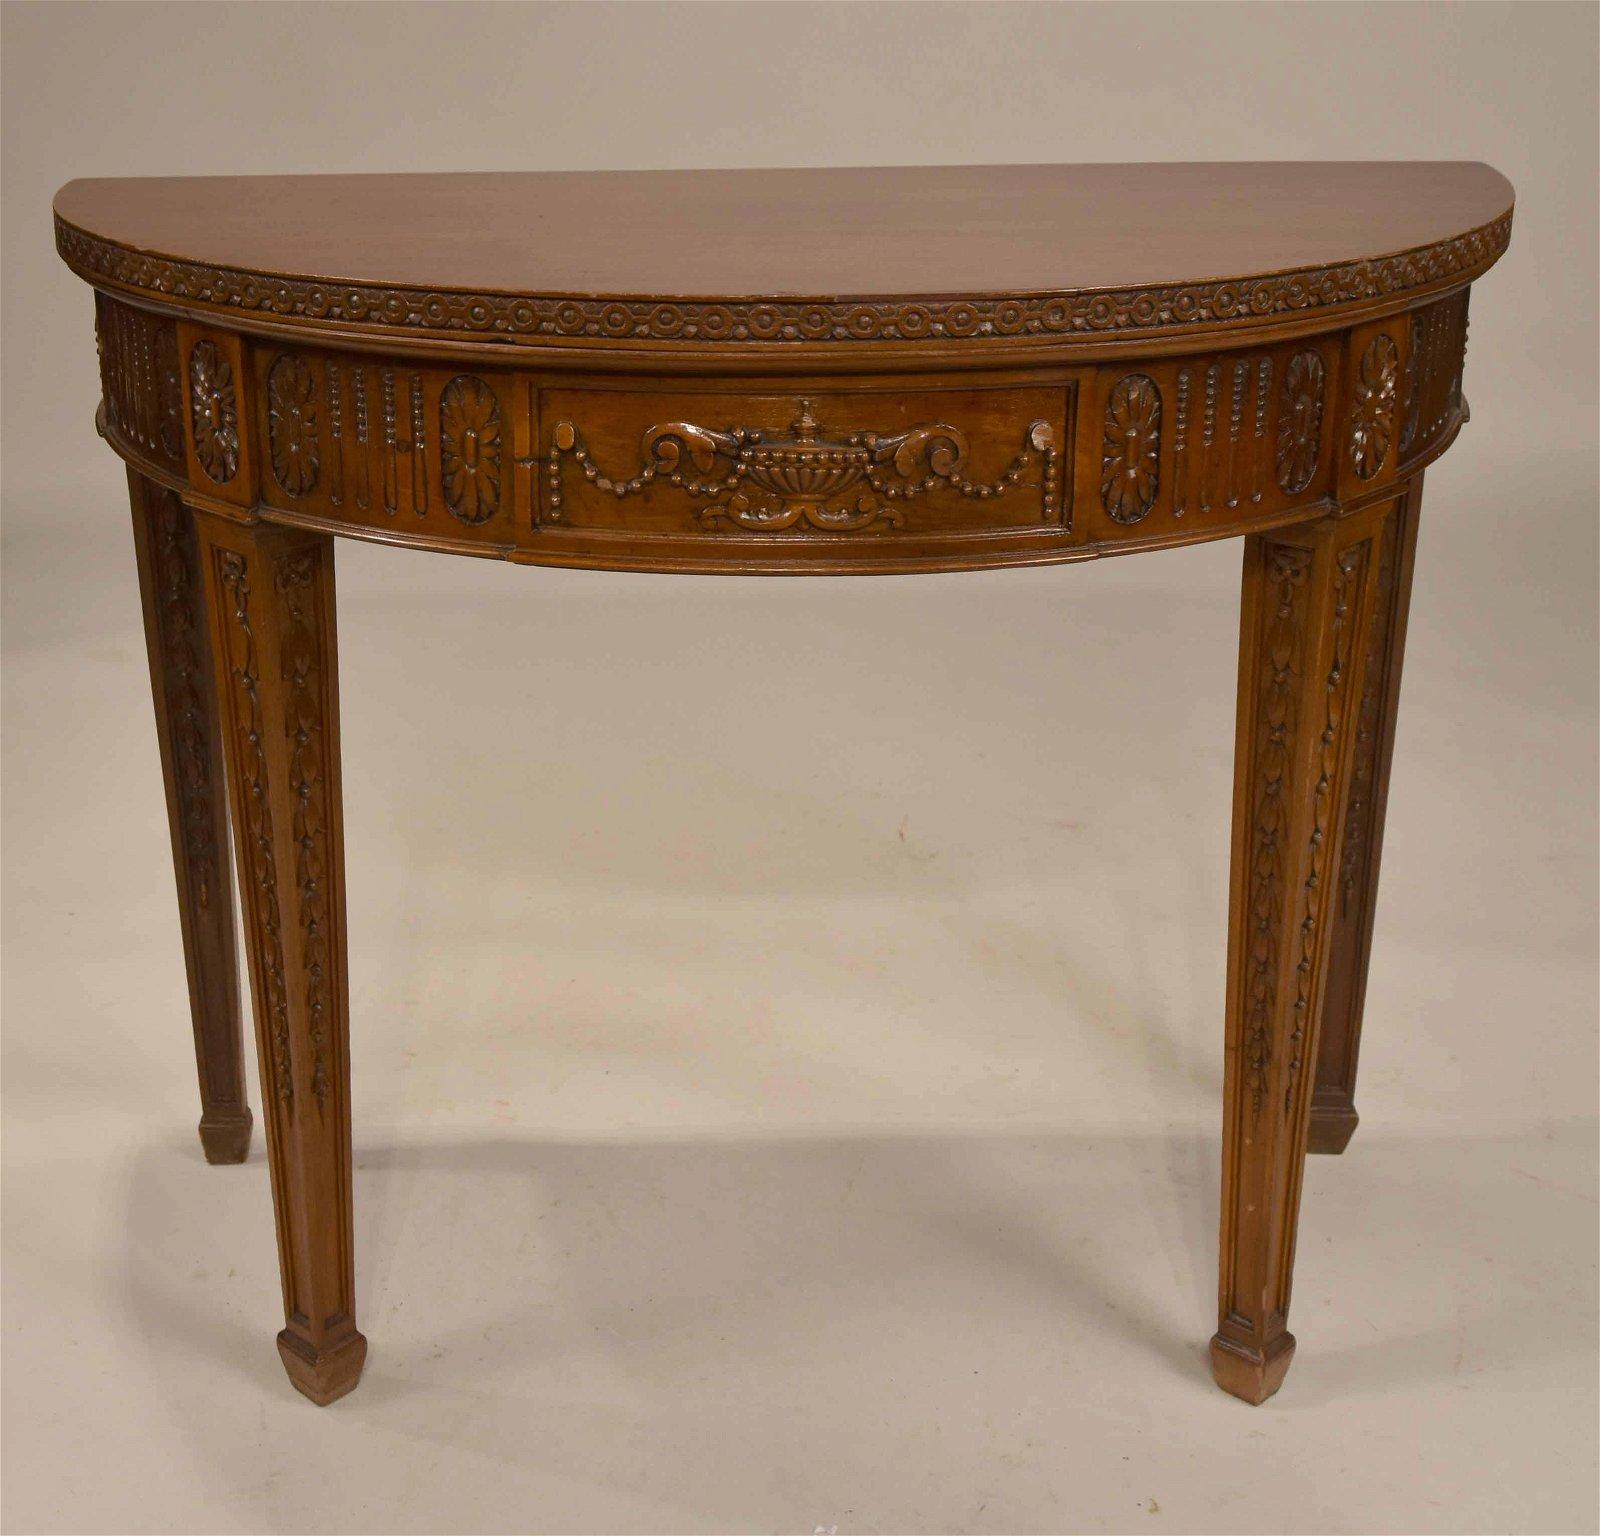 George III Style Mahogany Demi-Lune Pier Table